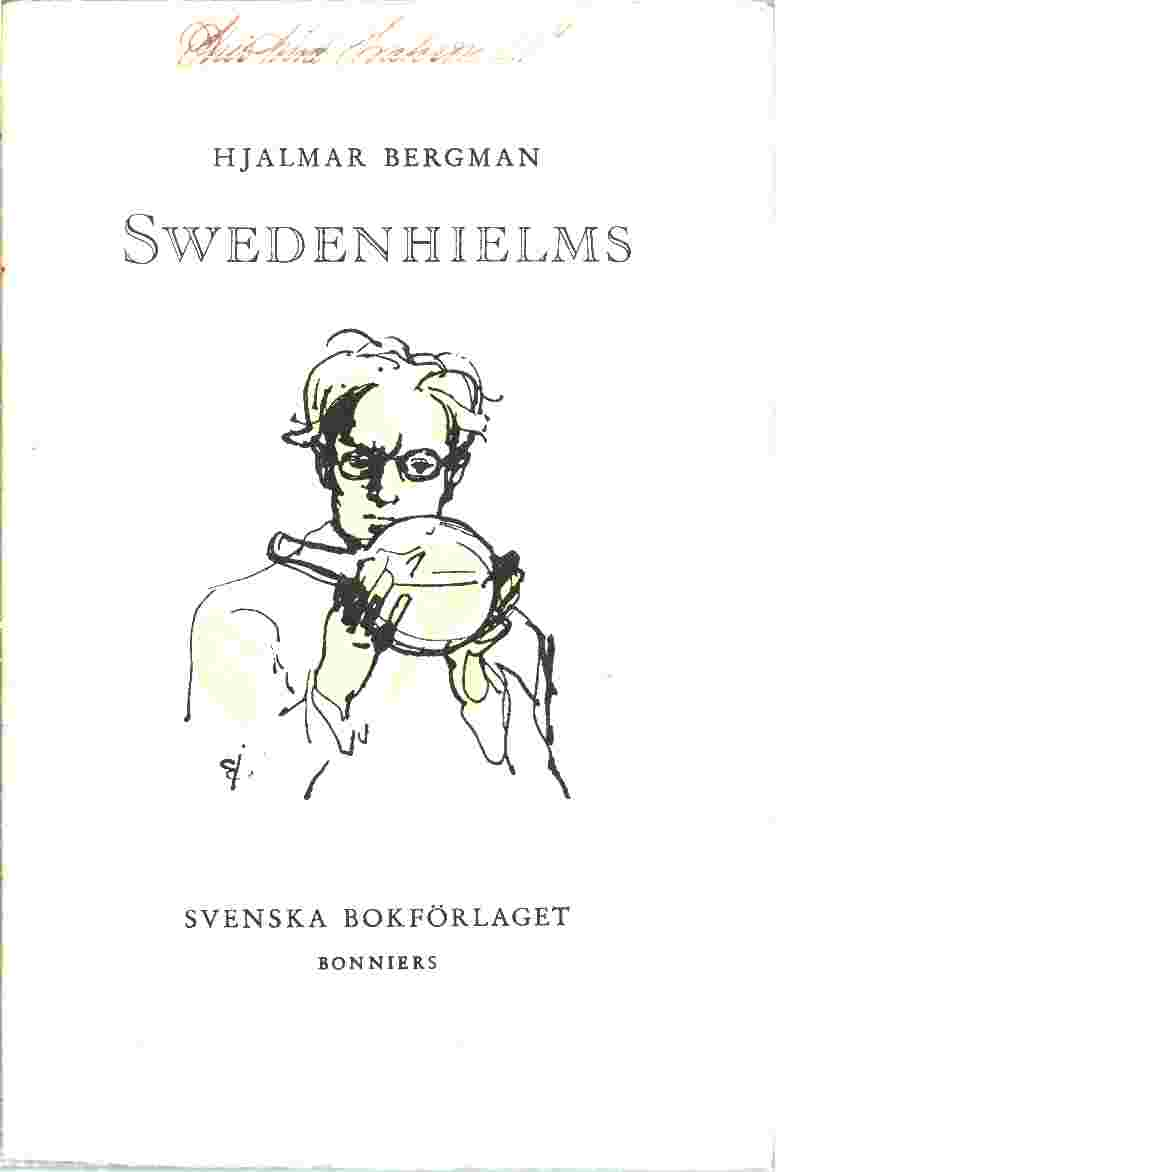 Swedenhielms - Bergman, Hjalmar